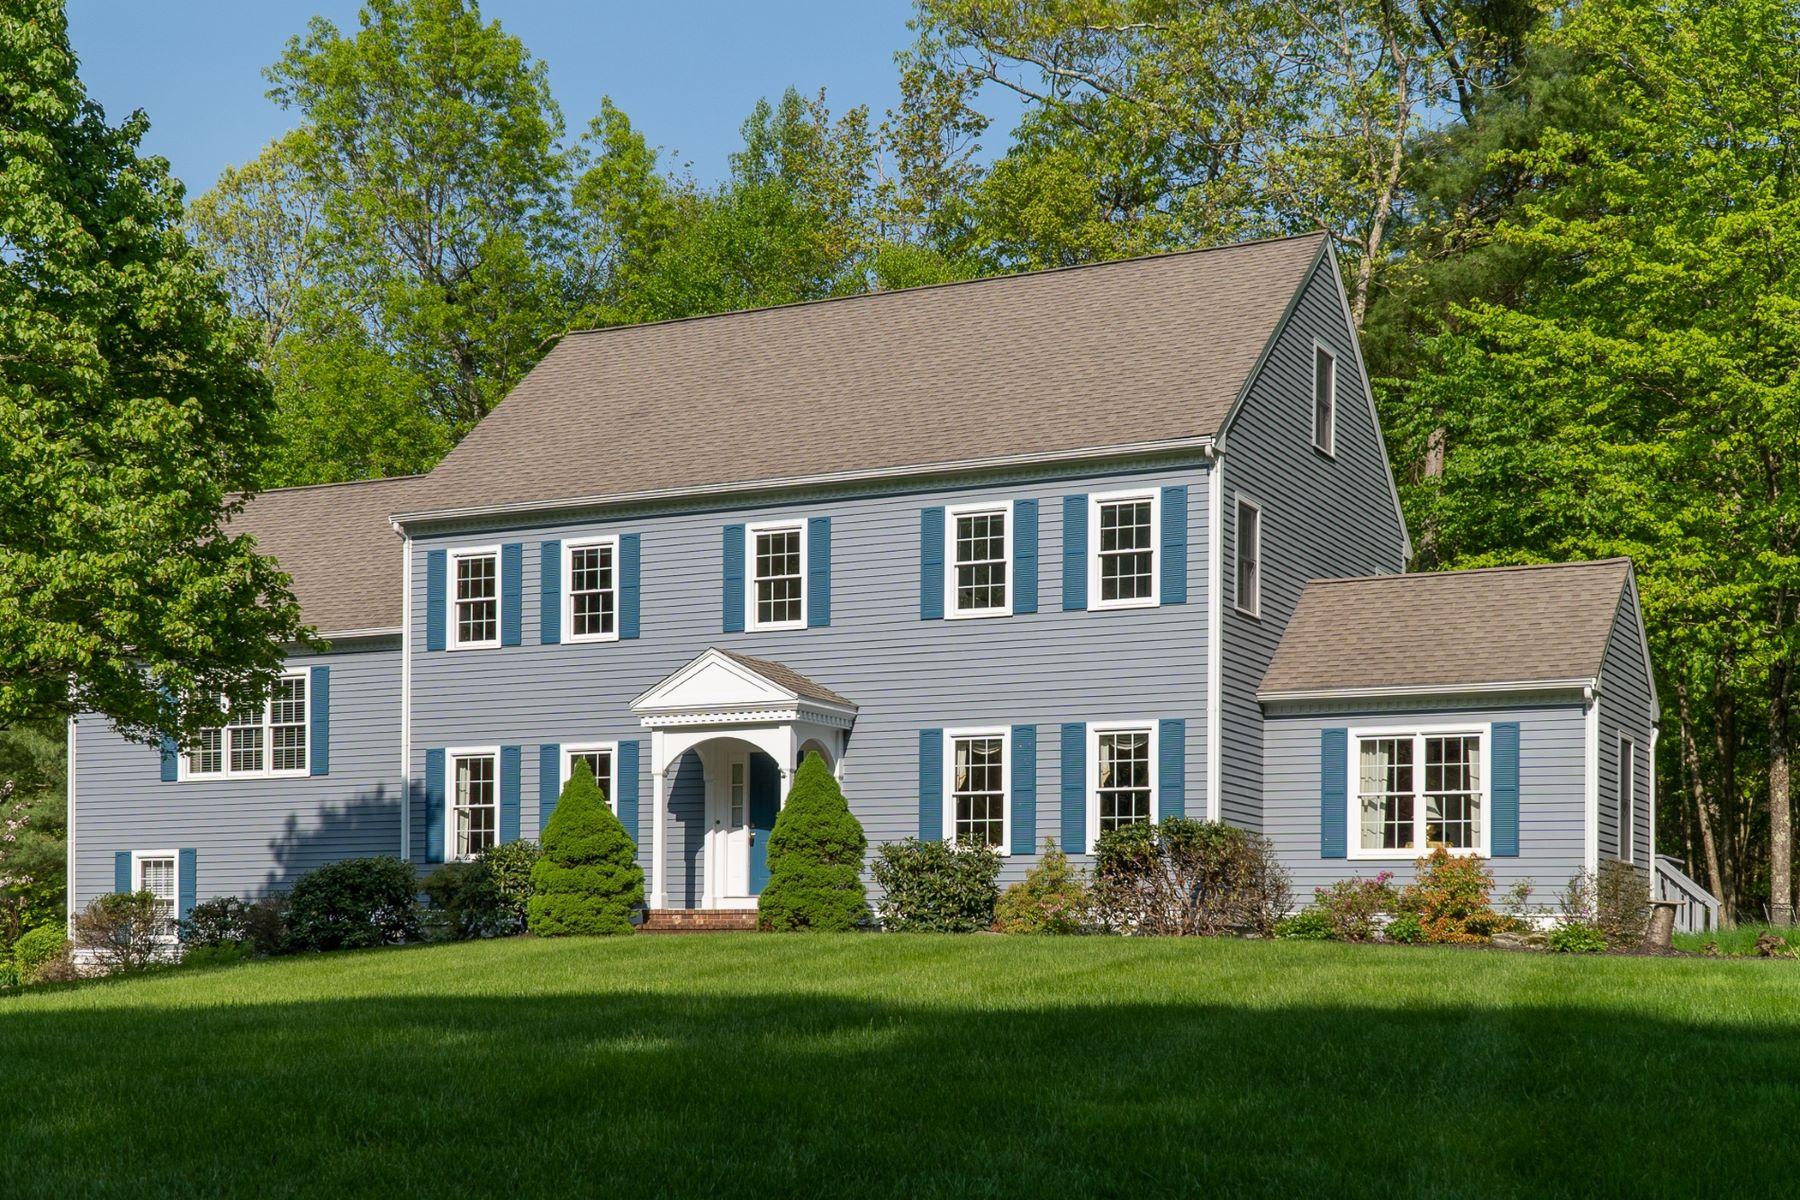 Single Family Homes για την Πώληση στο 525 Old Harvard Road, Boxborough 525 Old Harvard Rd, Boxborough, Μασαχουσετη 01719 Ηνωμένες Πολιτείες